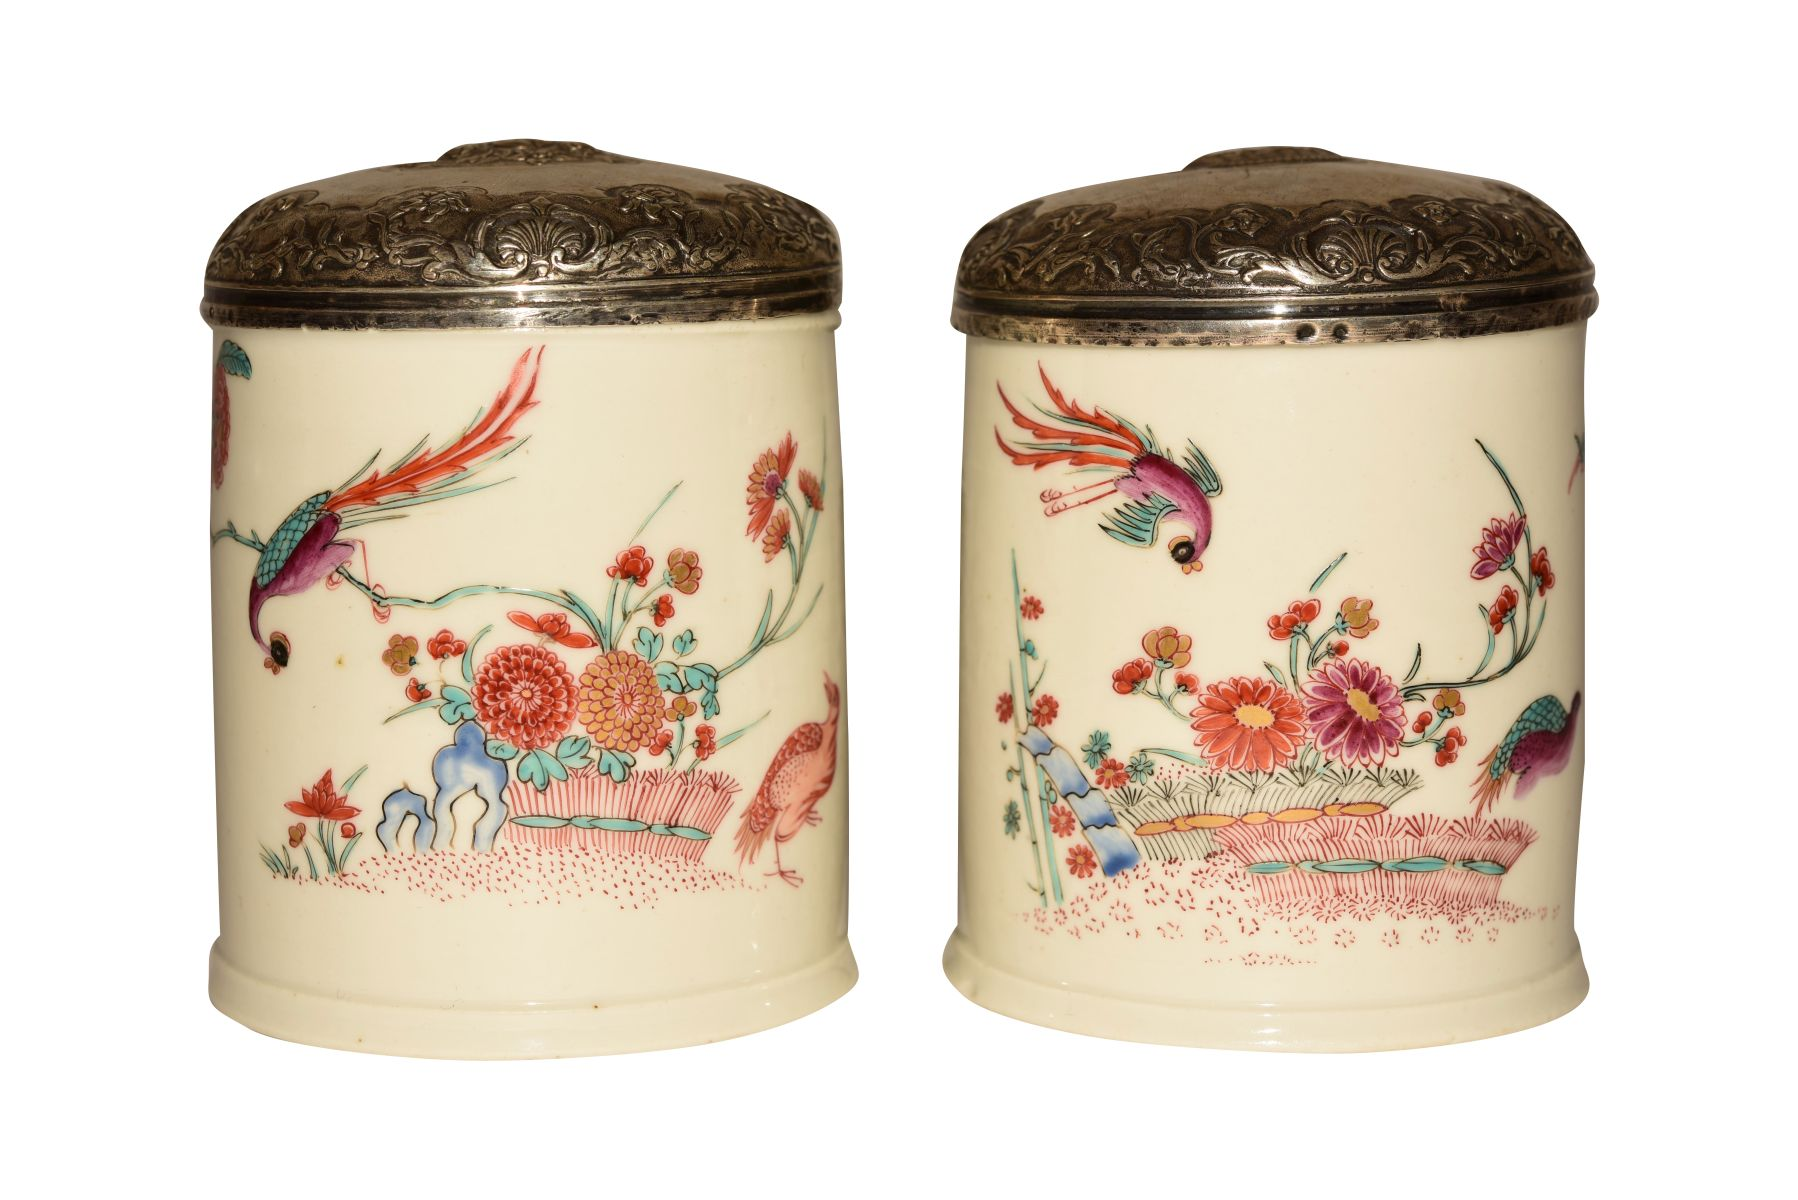 #77 2 porcelain boxes with silver-plated lids | 2 Porzellandosen mit versilbertem Deckel Image